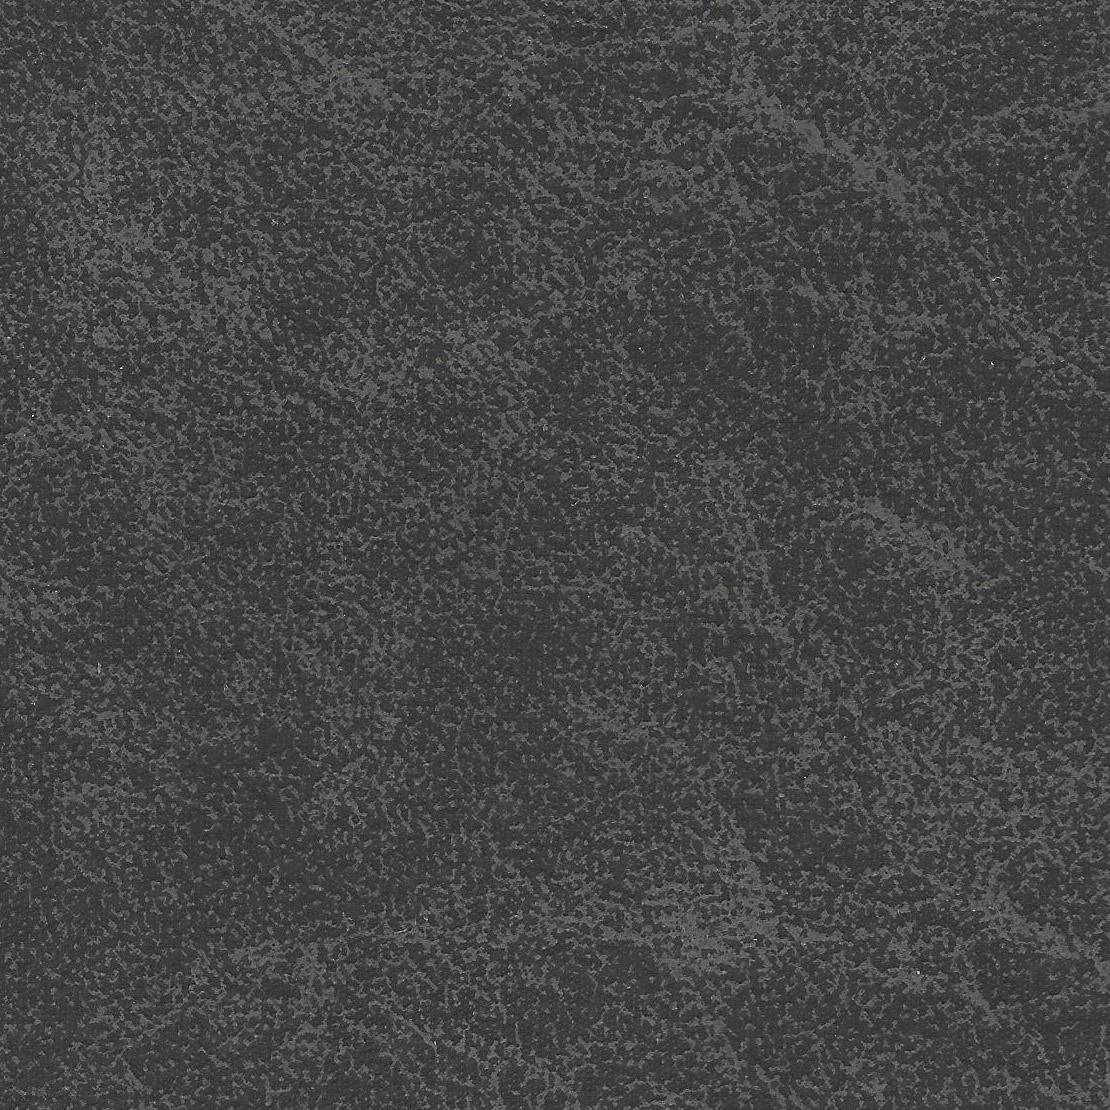 Yacht graphite